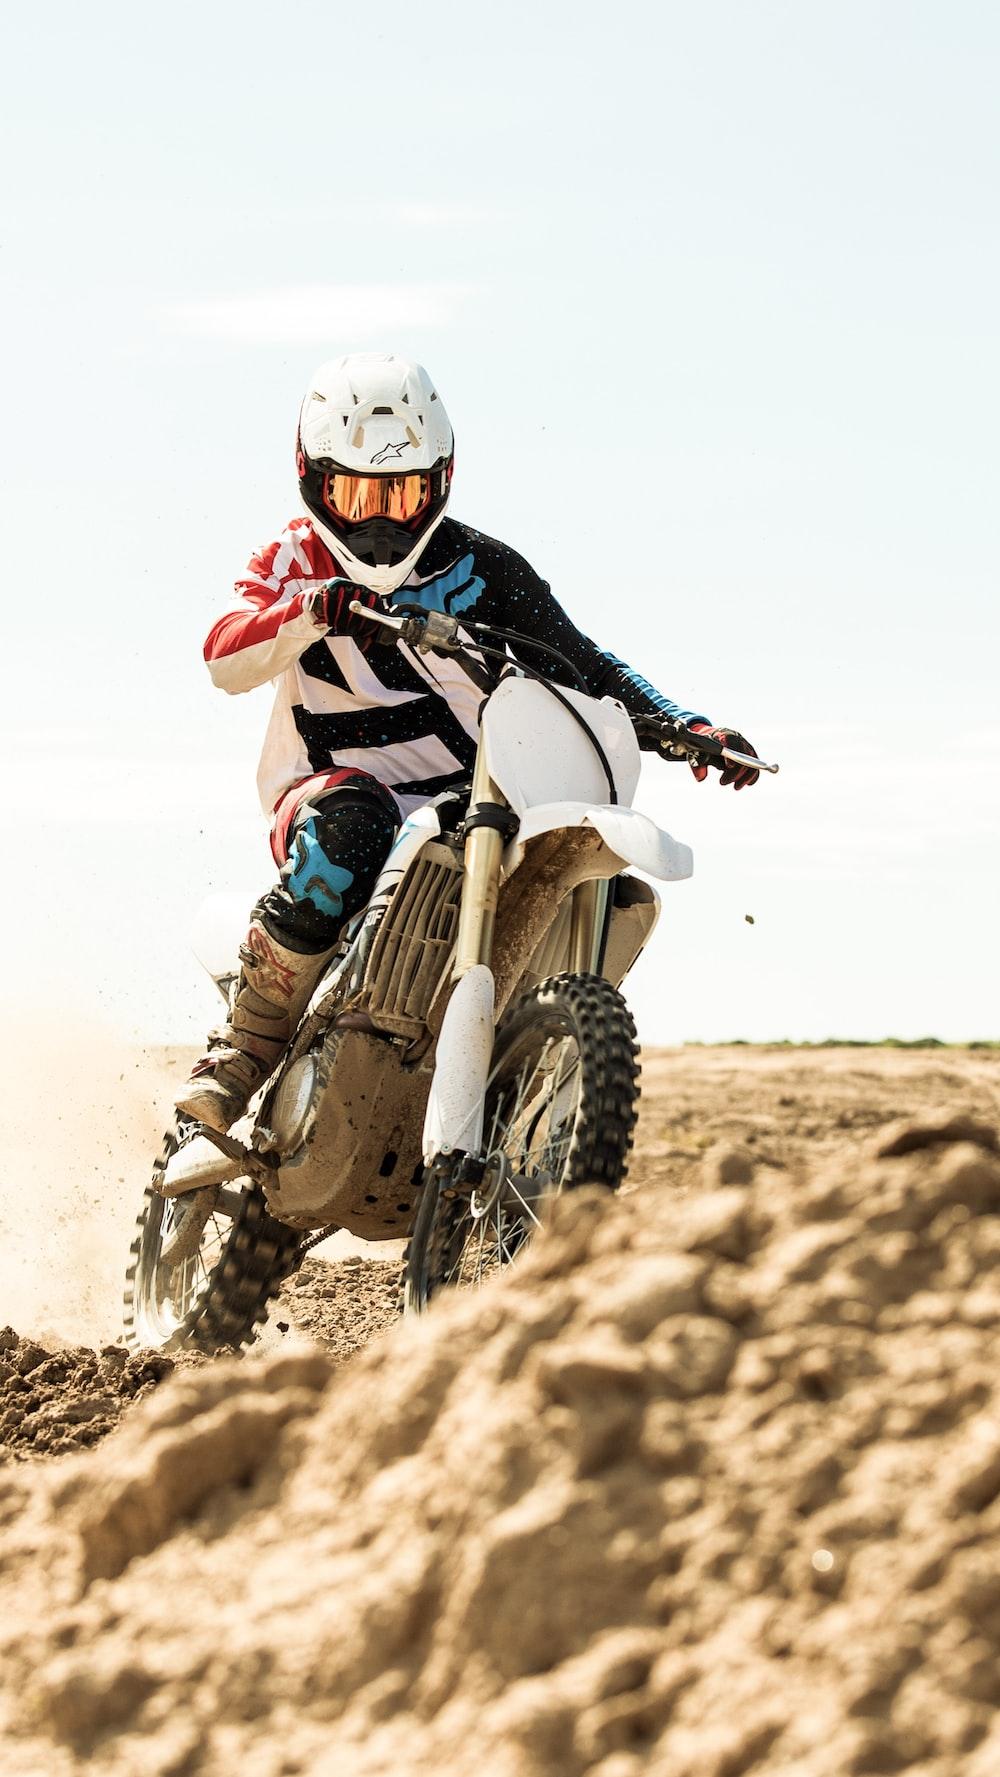 man riding motocross motorcycle